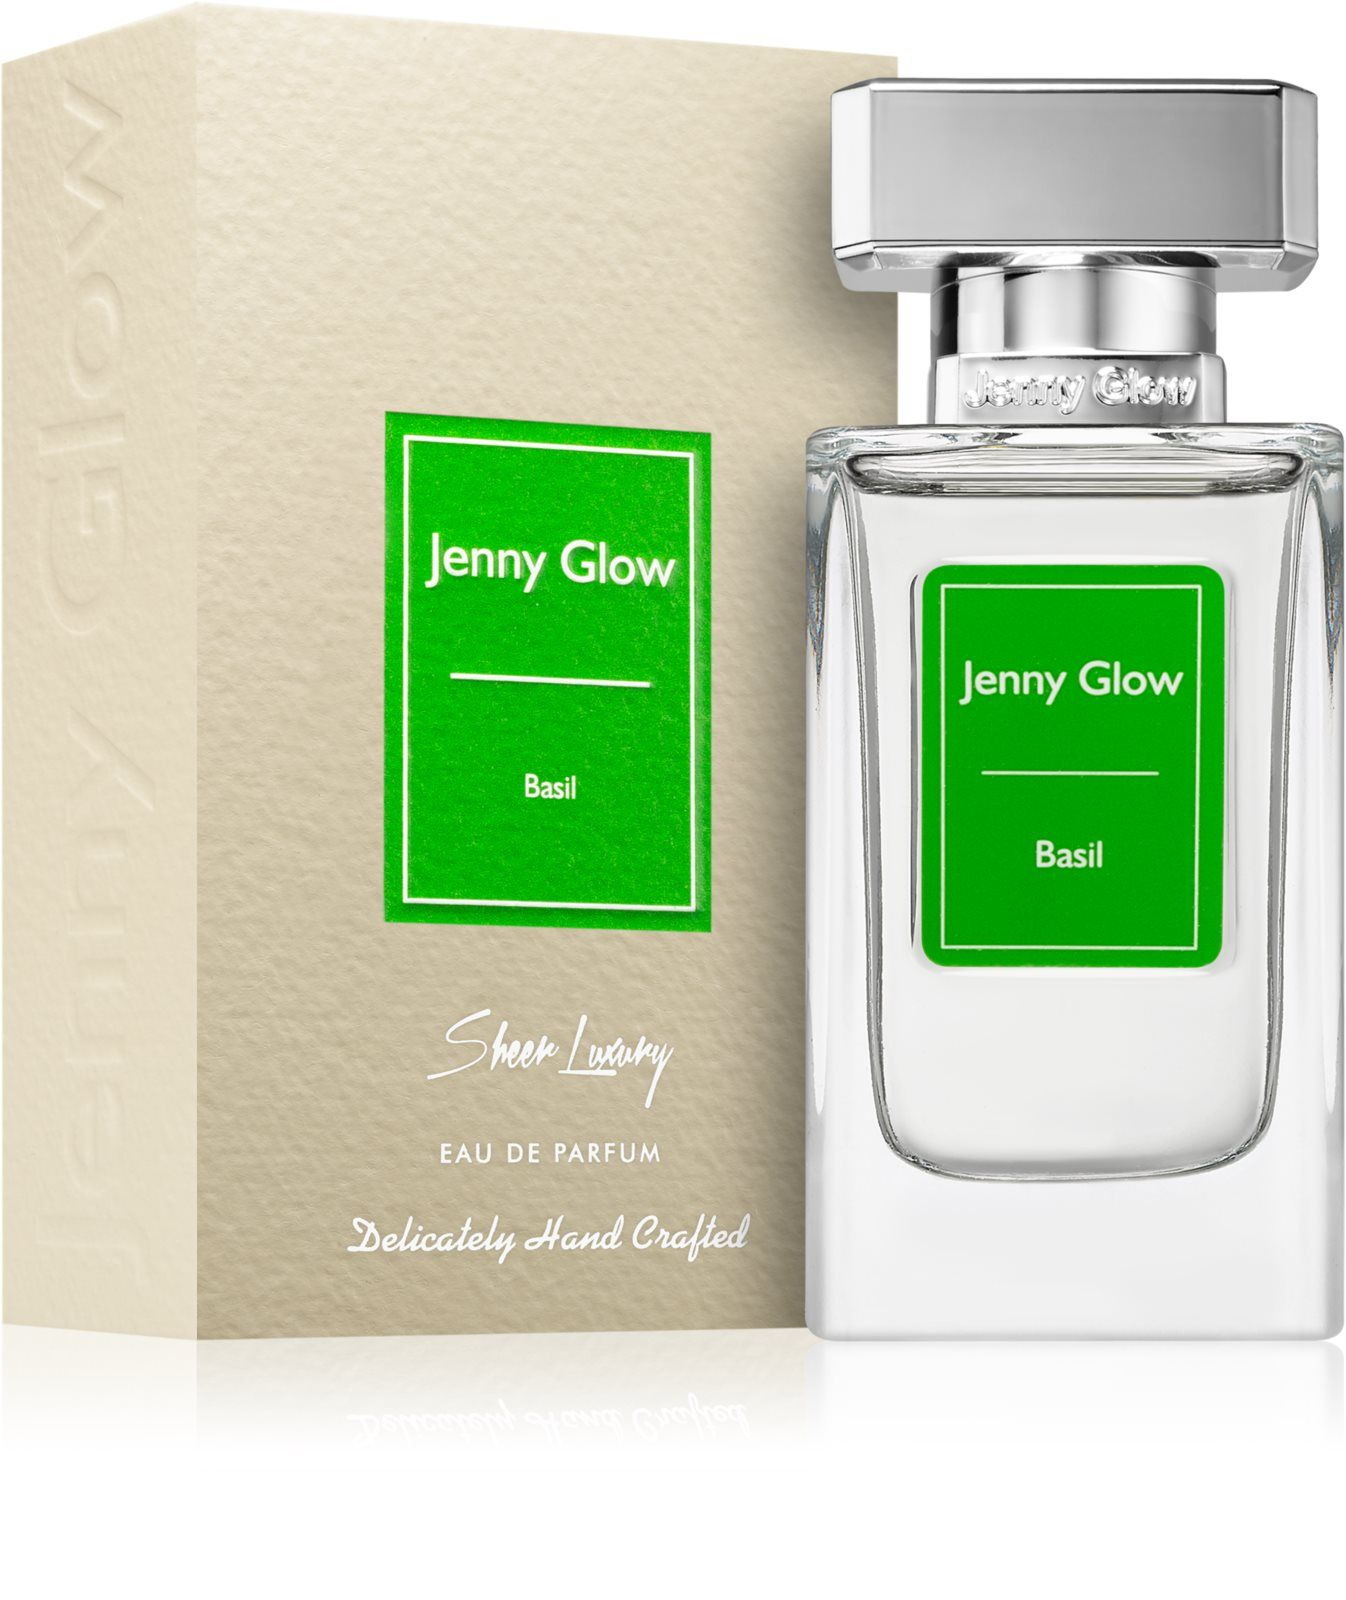 jenny glow basil